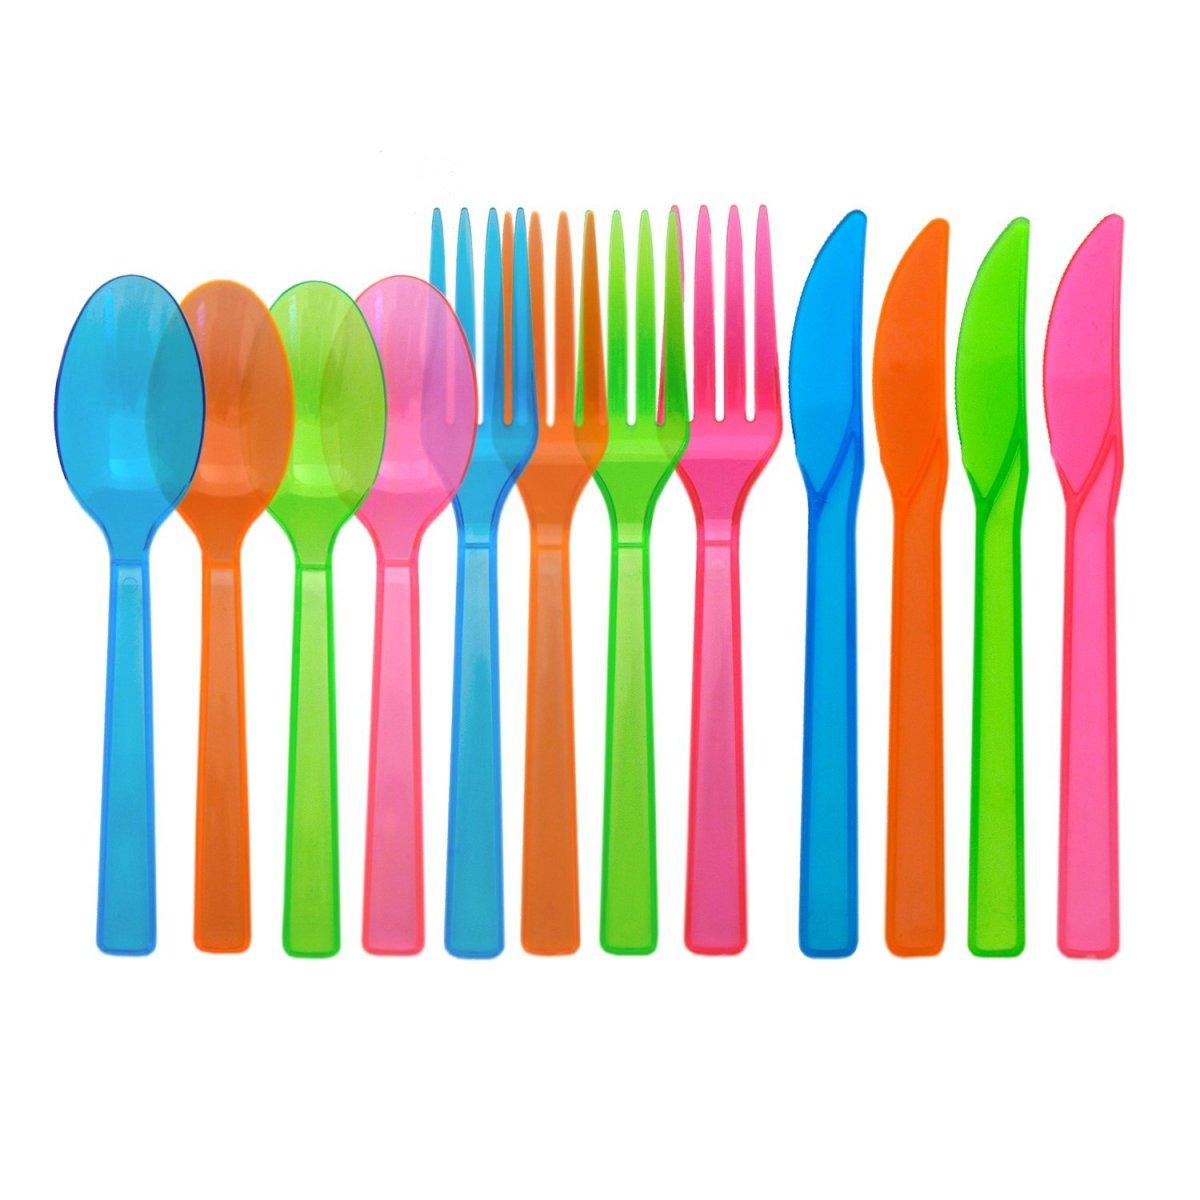 The Future of Plastic Cutlery: Bioplastics vs Plastic